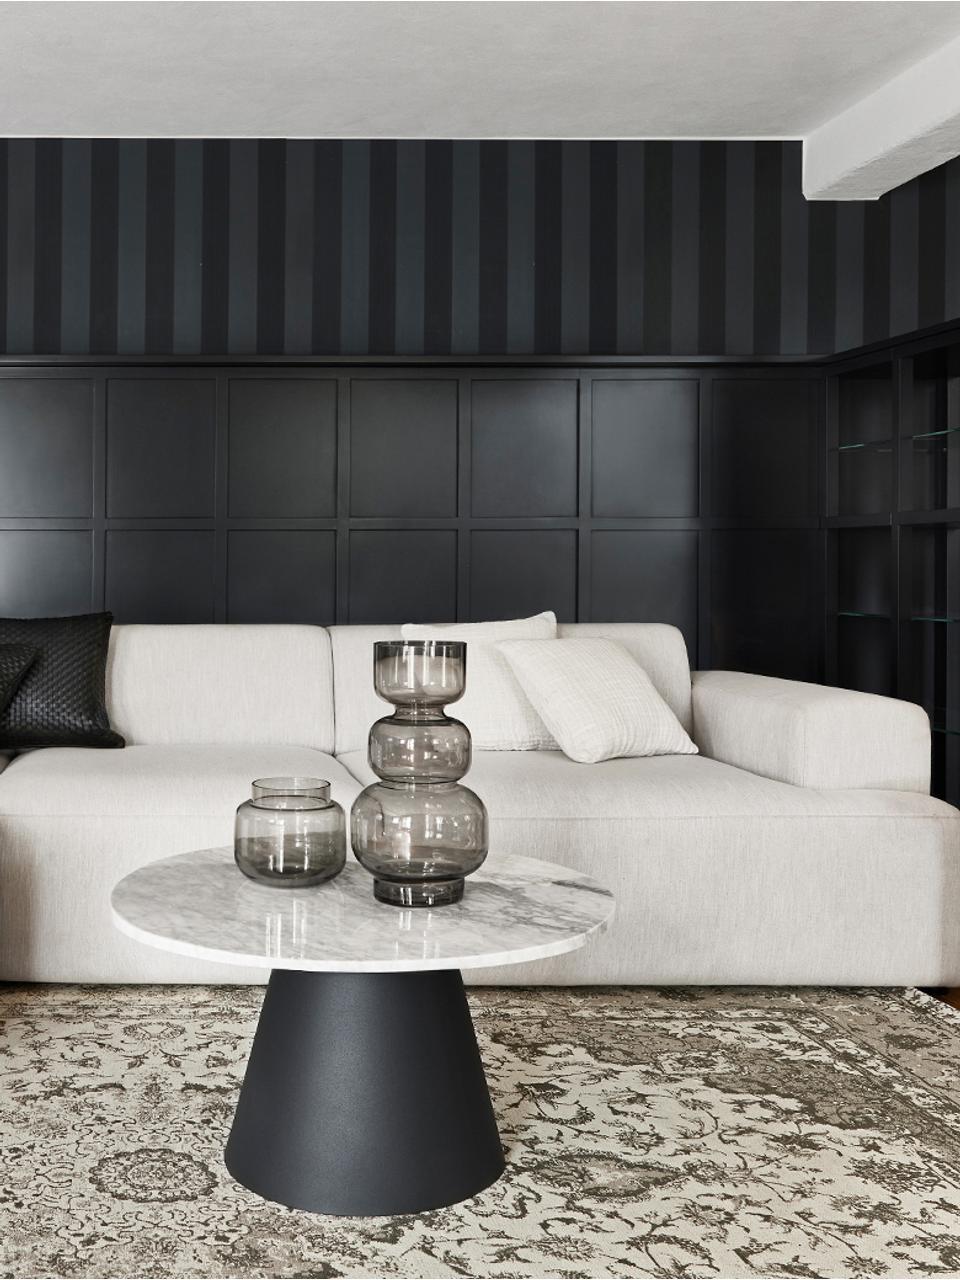 Hoekbank Melva (4-zits), Bekleding: polyester, Frame: massief grenenhout, spaan, Poten: grenenhout, Geweven stof beige, B 319 x D 144 cm